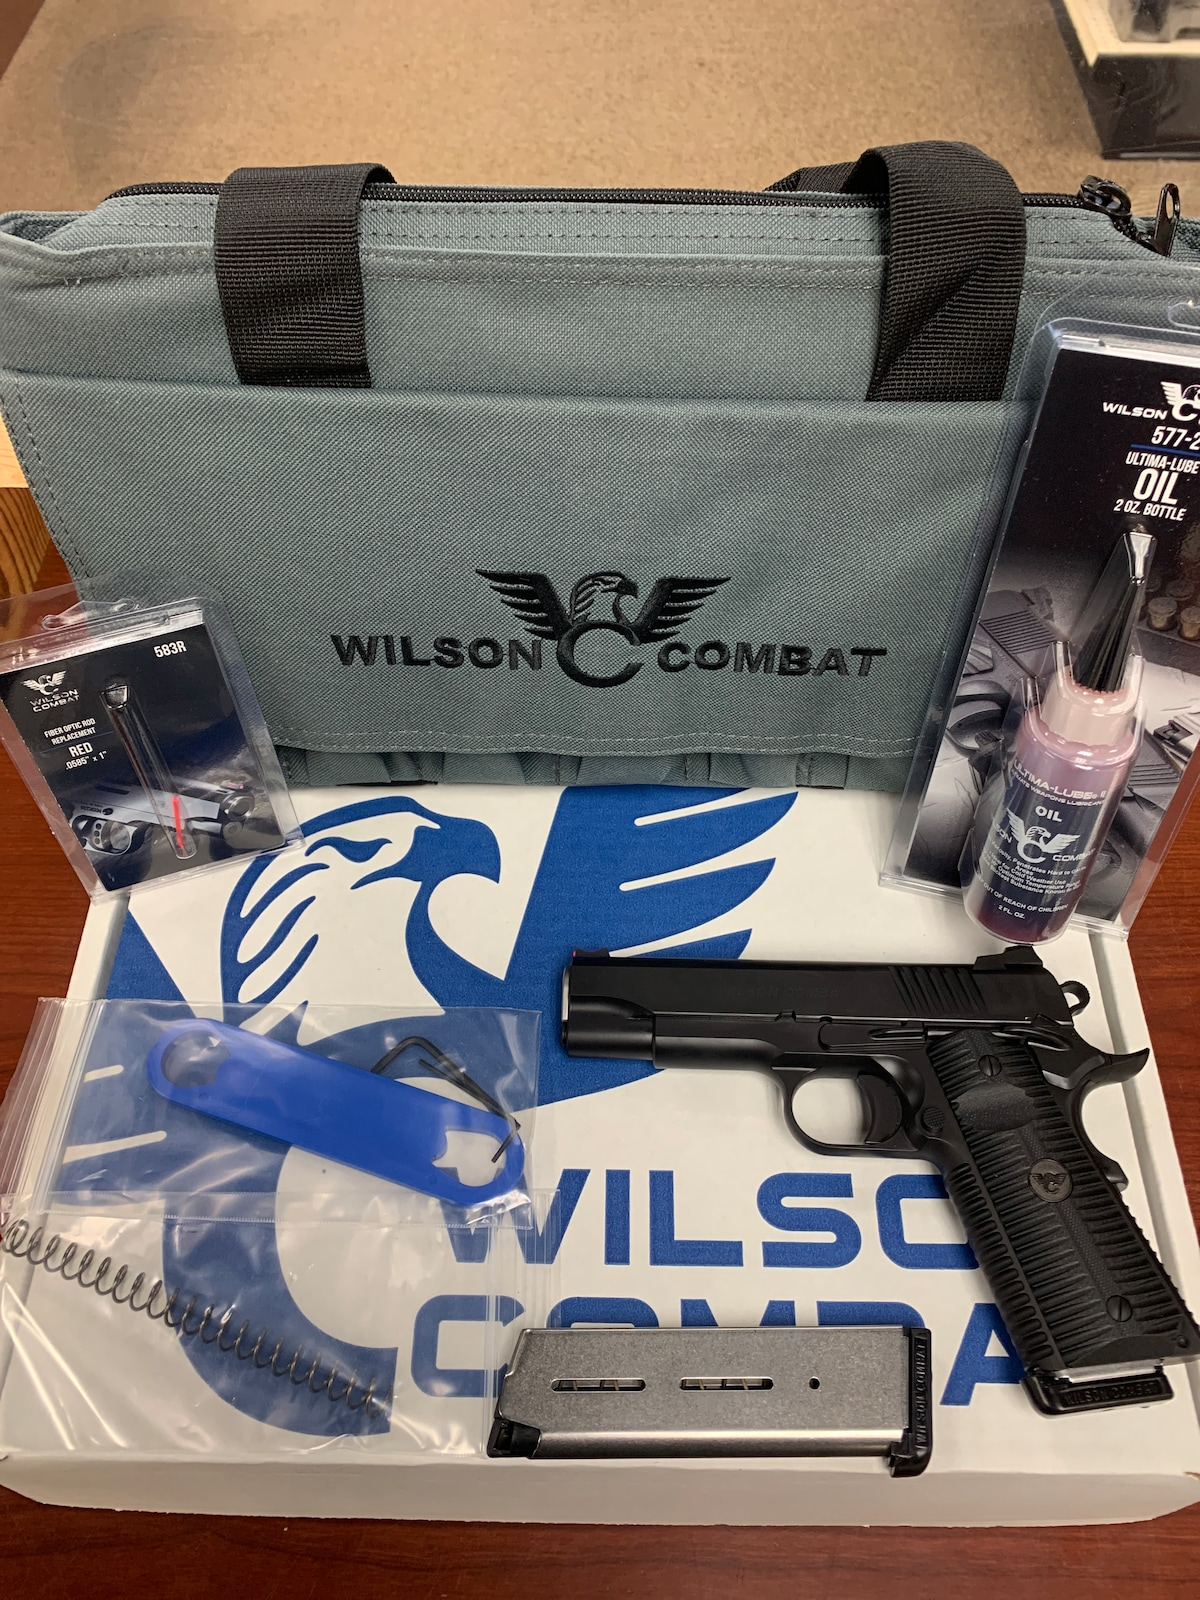 WILSON COMBAT ACP COMMANDER ACP-COM-45 EAGLE CLAW GRIP 810025501044